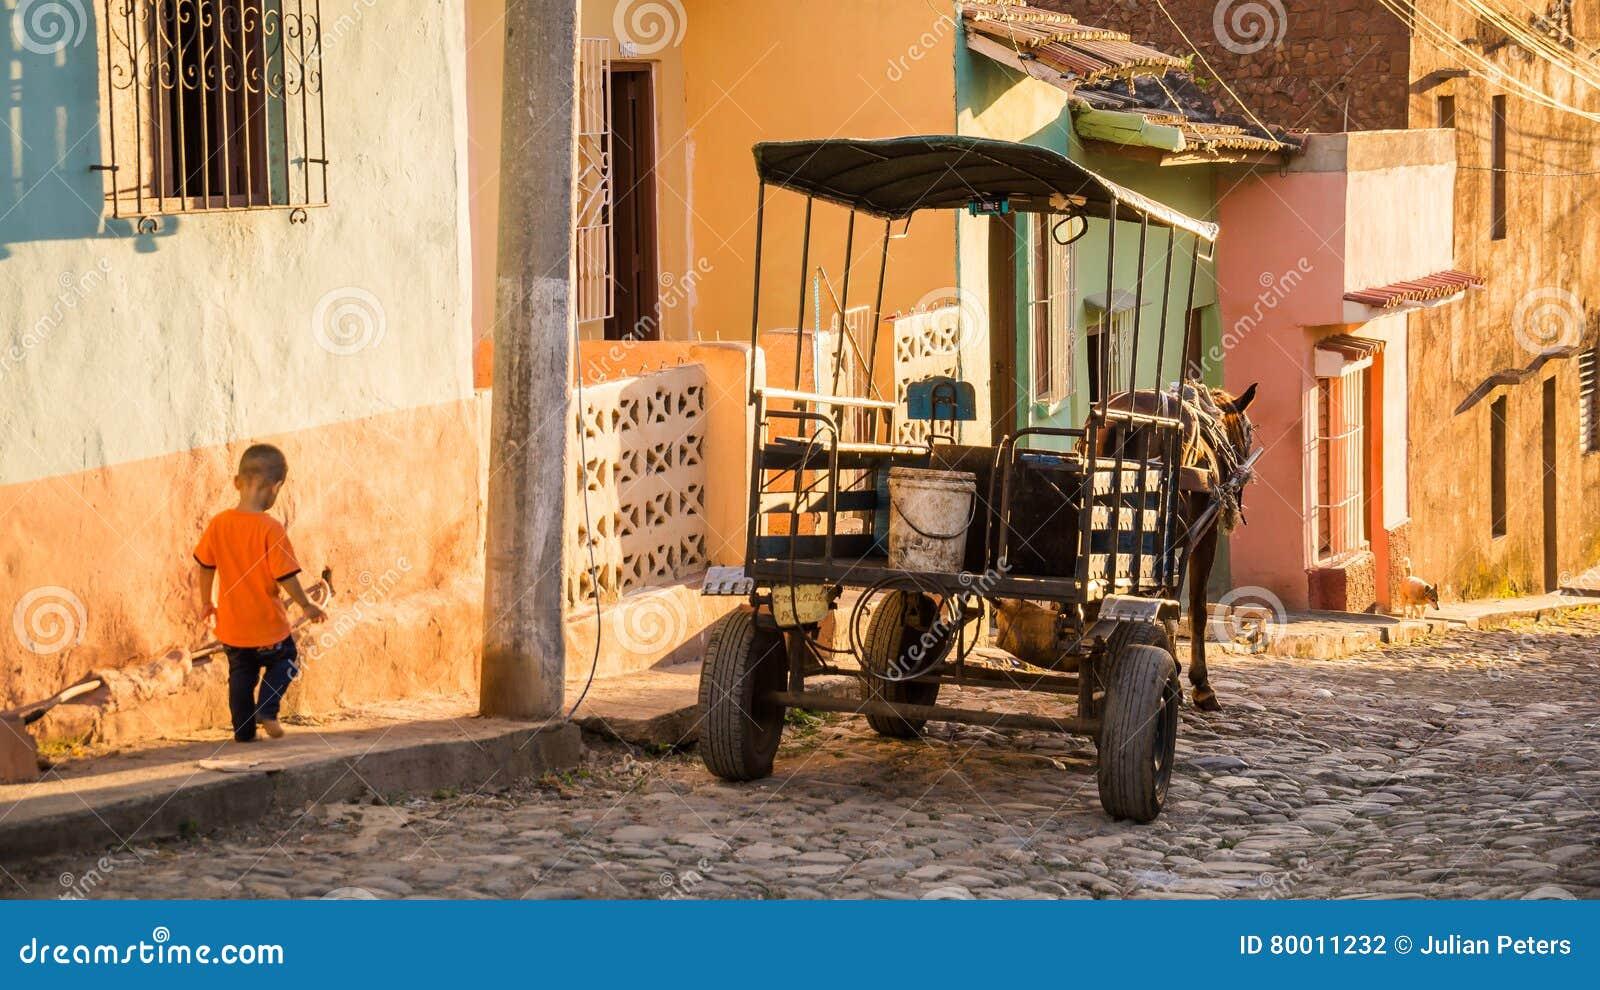 Pferdewagen auf streetside in Trinidad, Kuba bei Sonnenuntergang